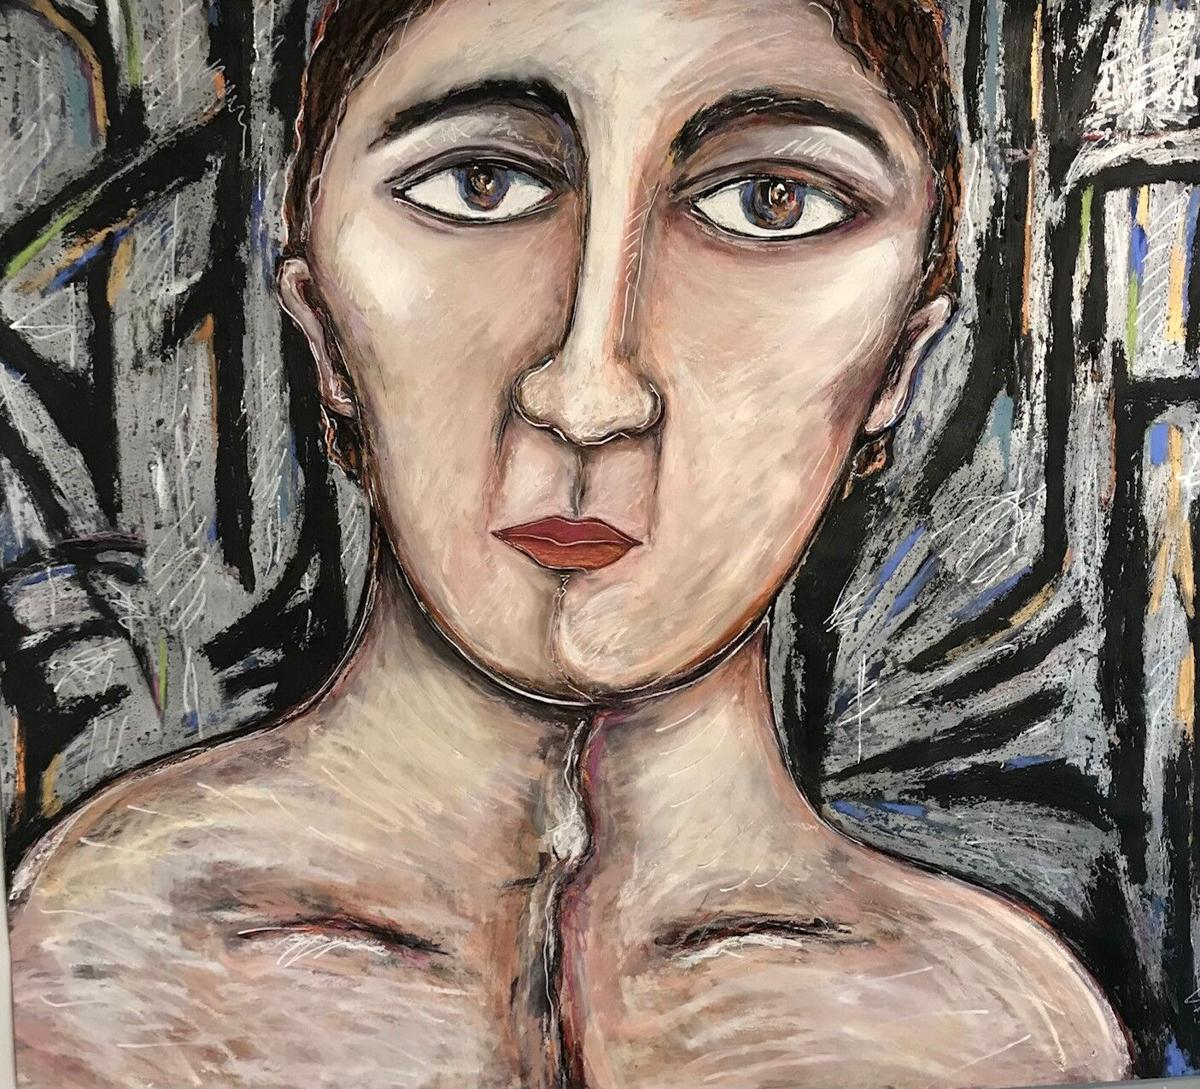 Image # 1 Untitled Portrait 2021- Becky Raubacher.jpg